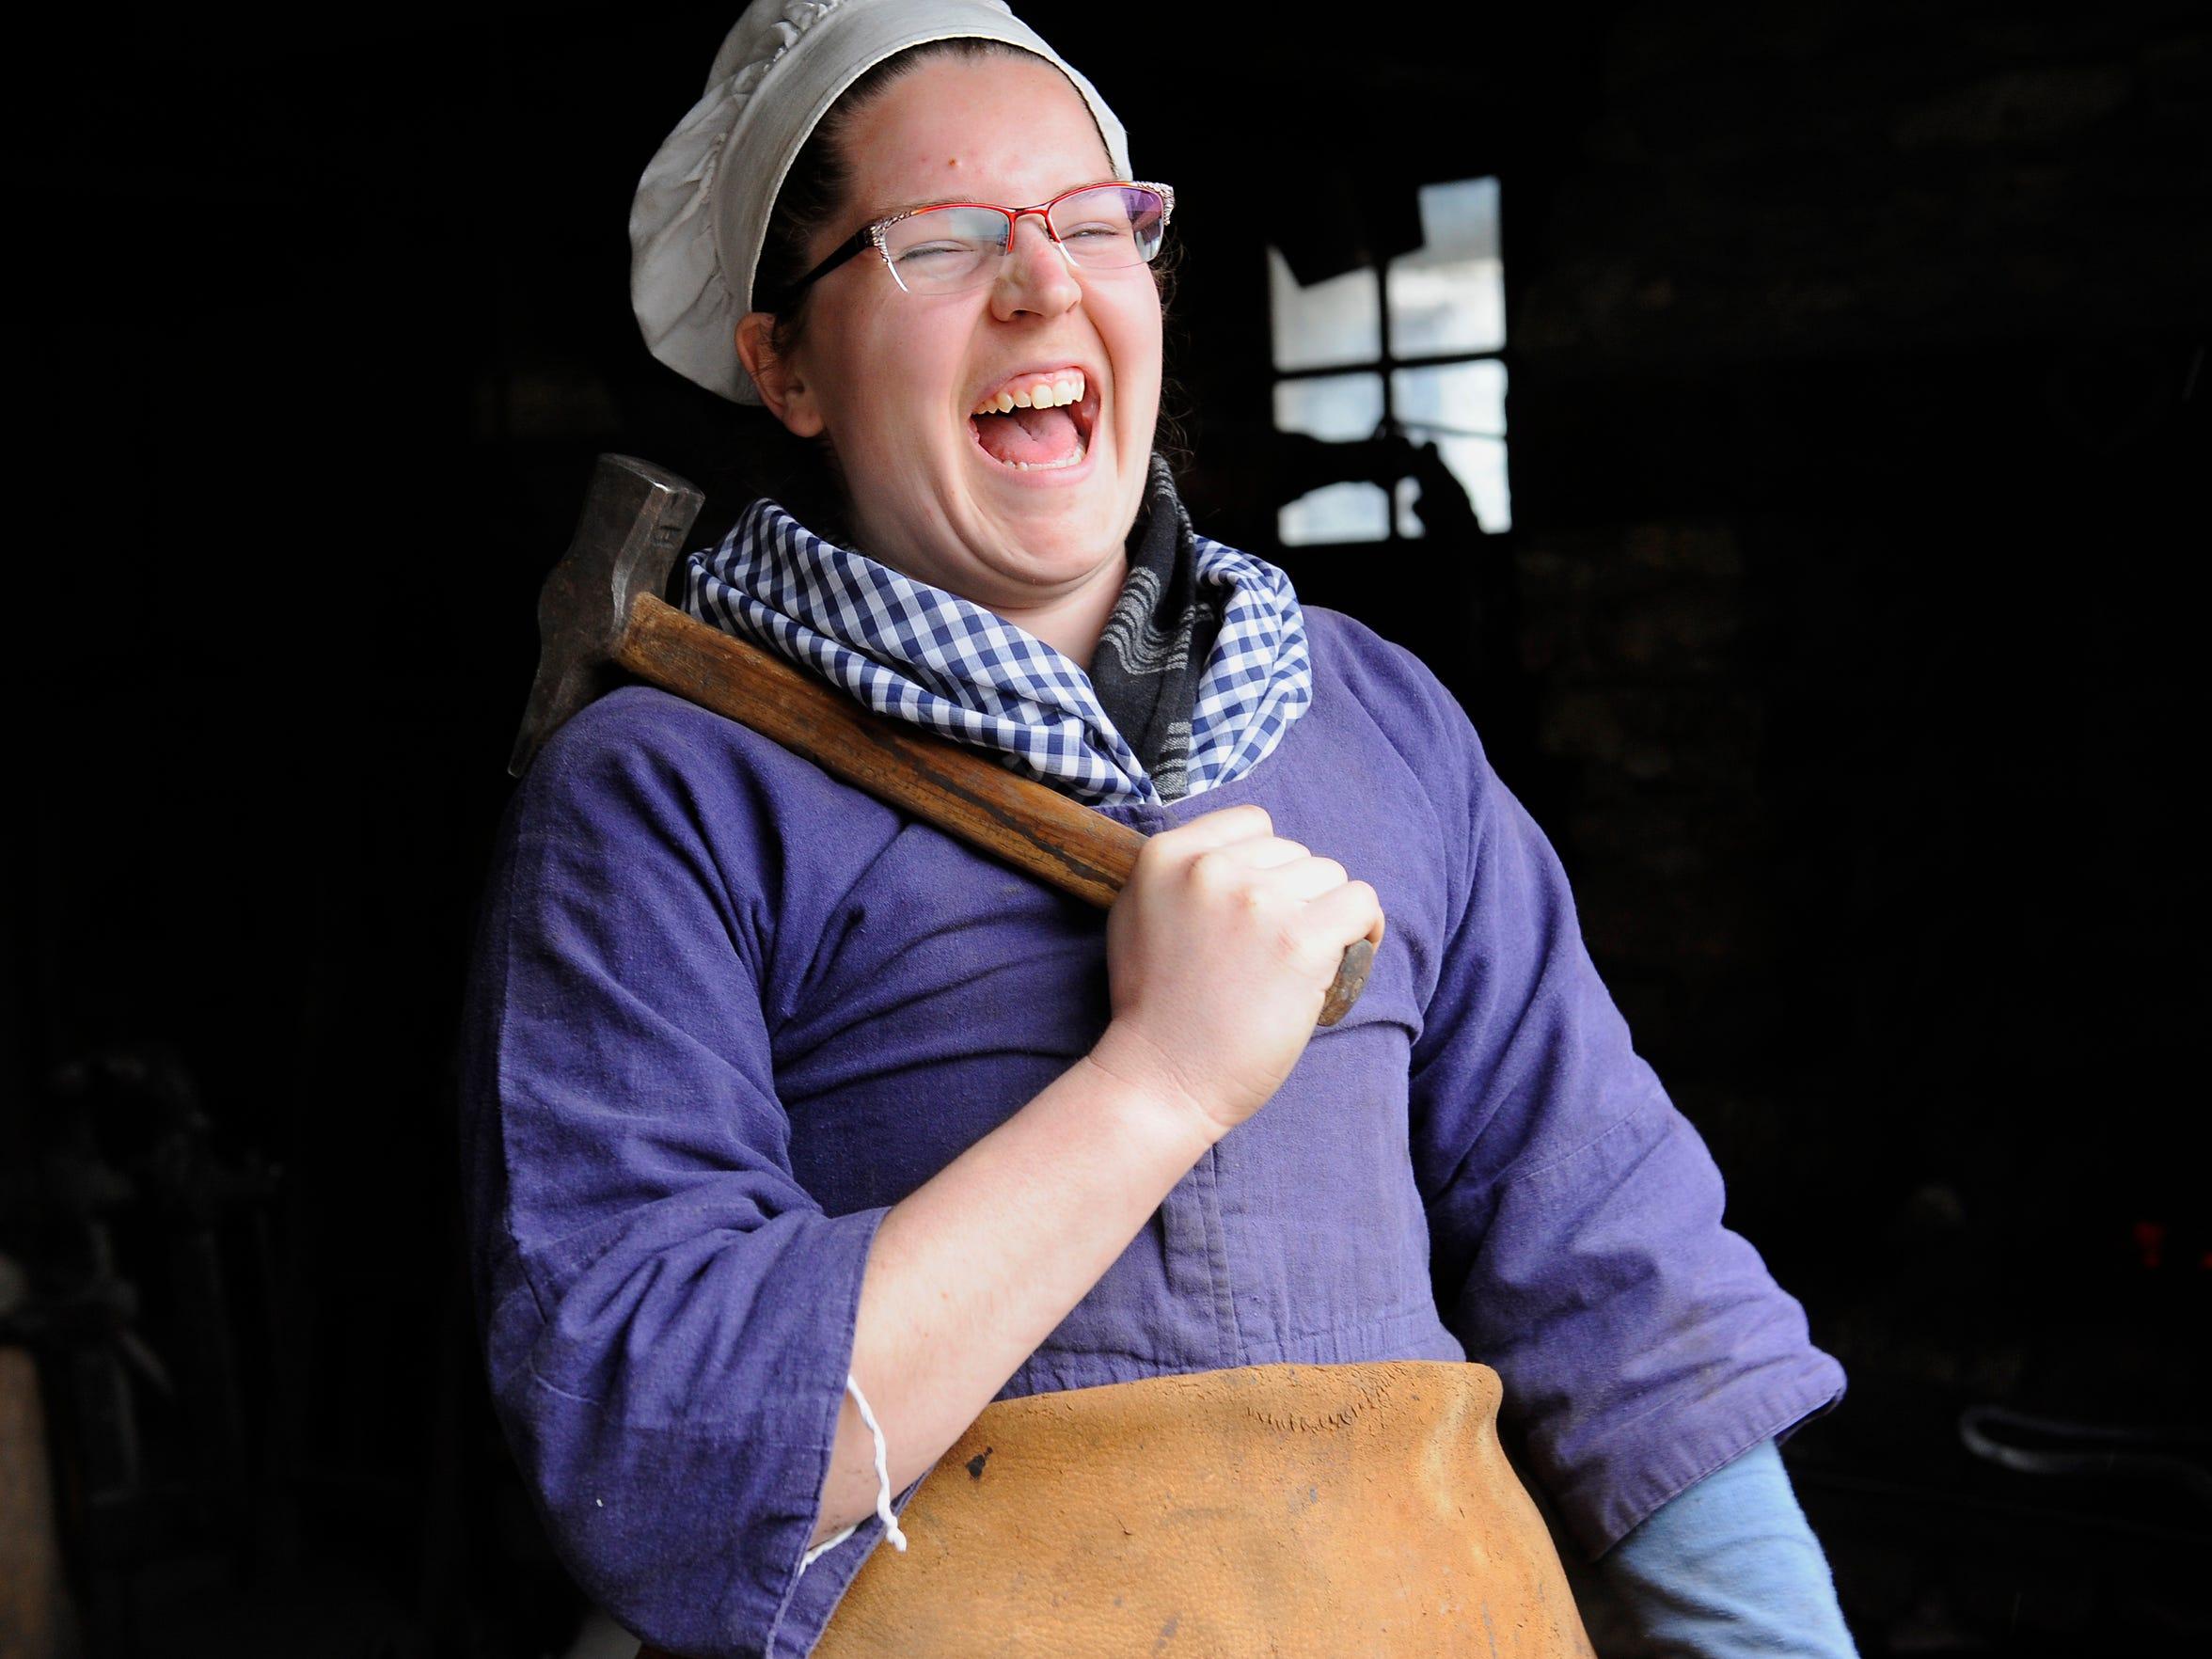 Blacksmith Dena Bliss laughs as she talks to visitors